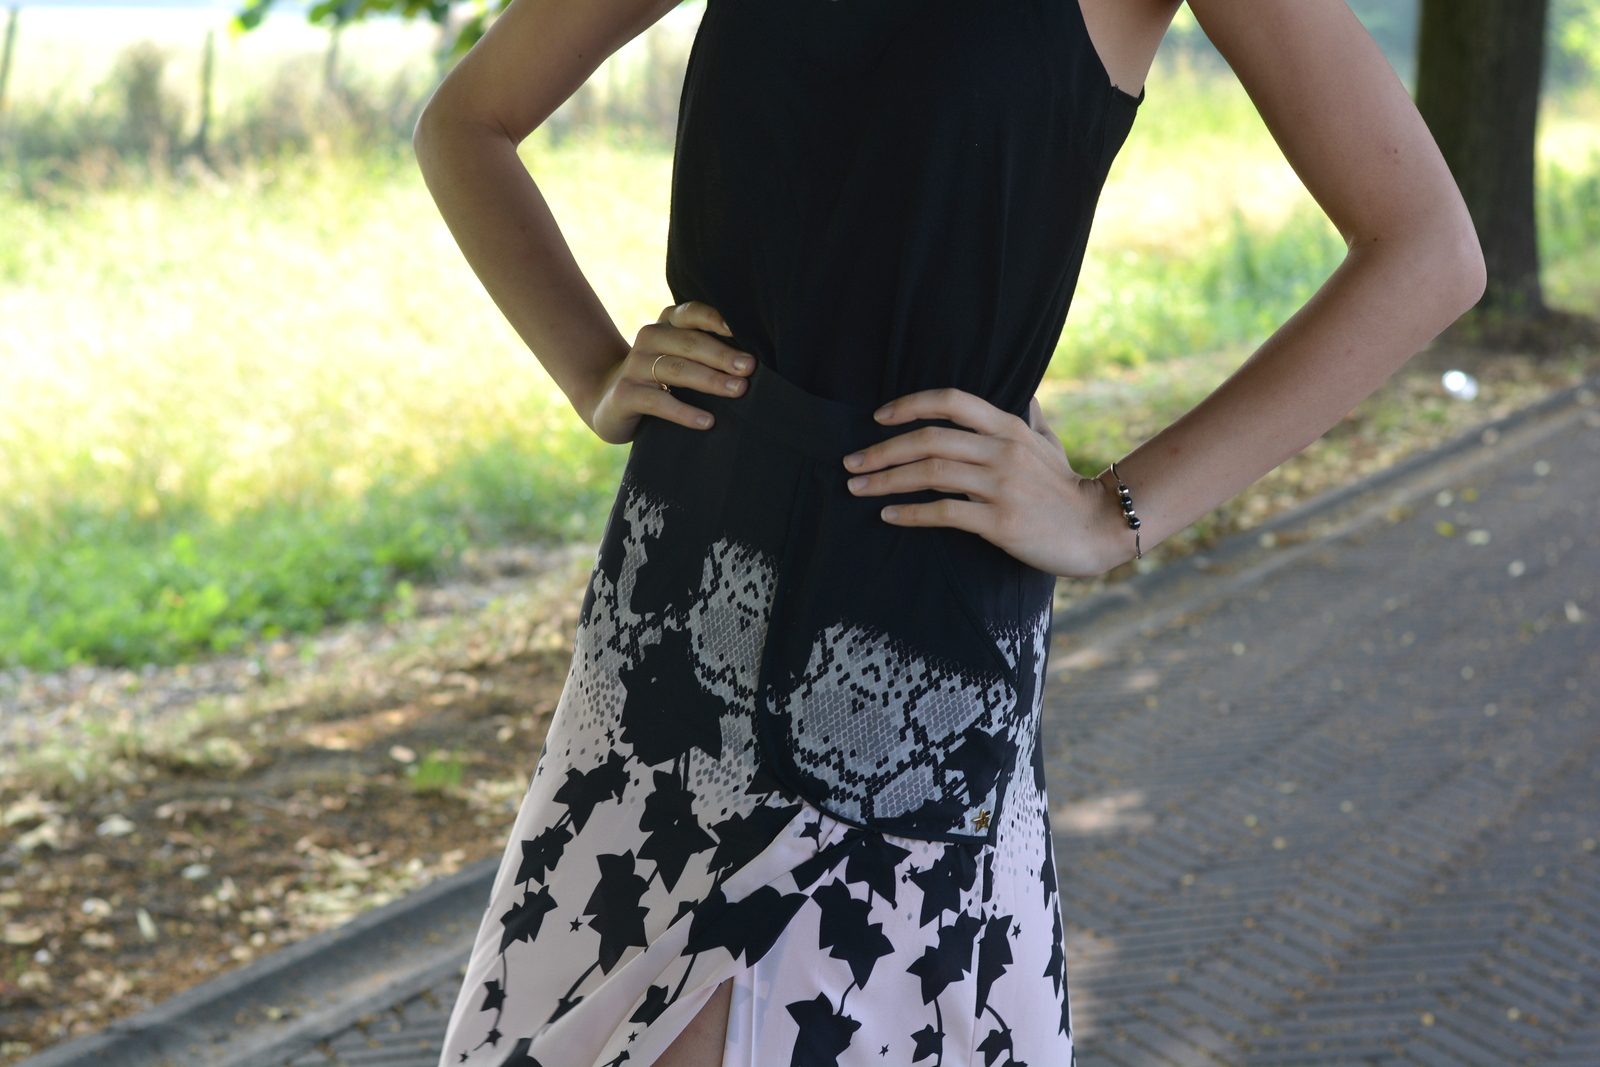 ootd, juliane borges, h&m, g2g, melissa, morellato, outfit, long skirt, summer,